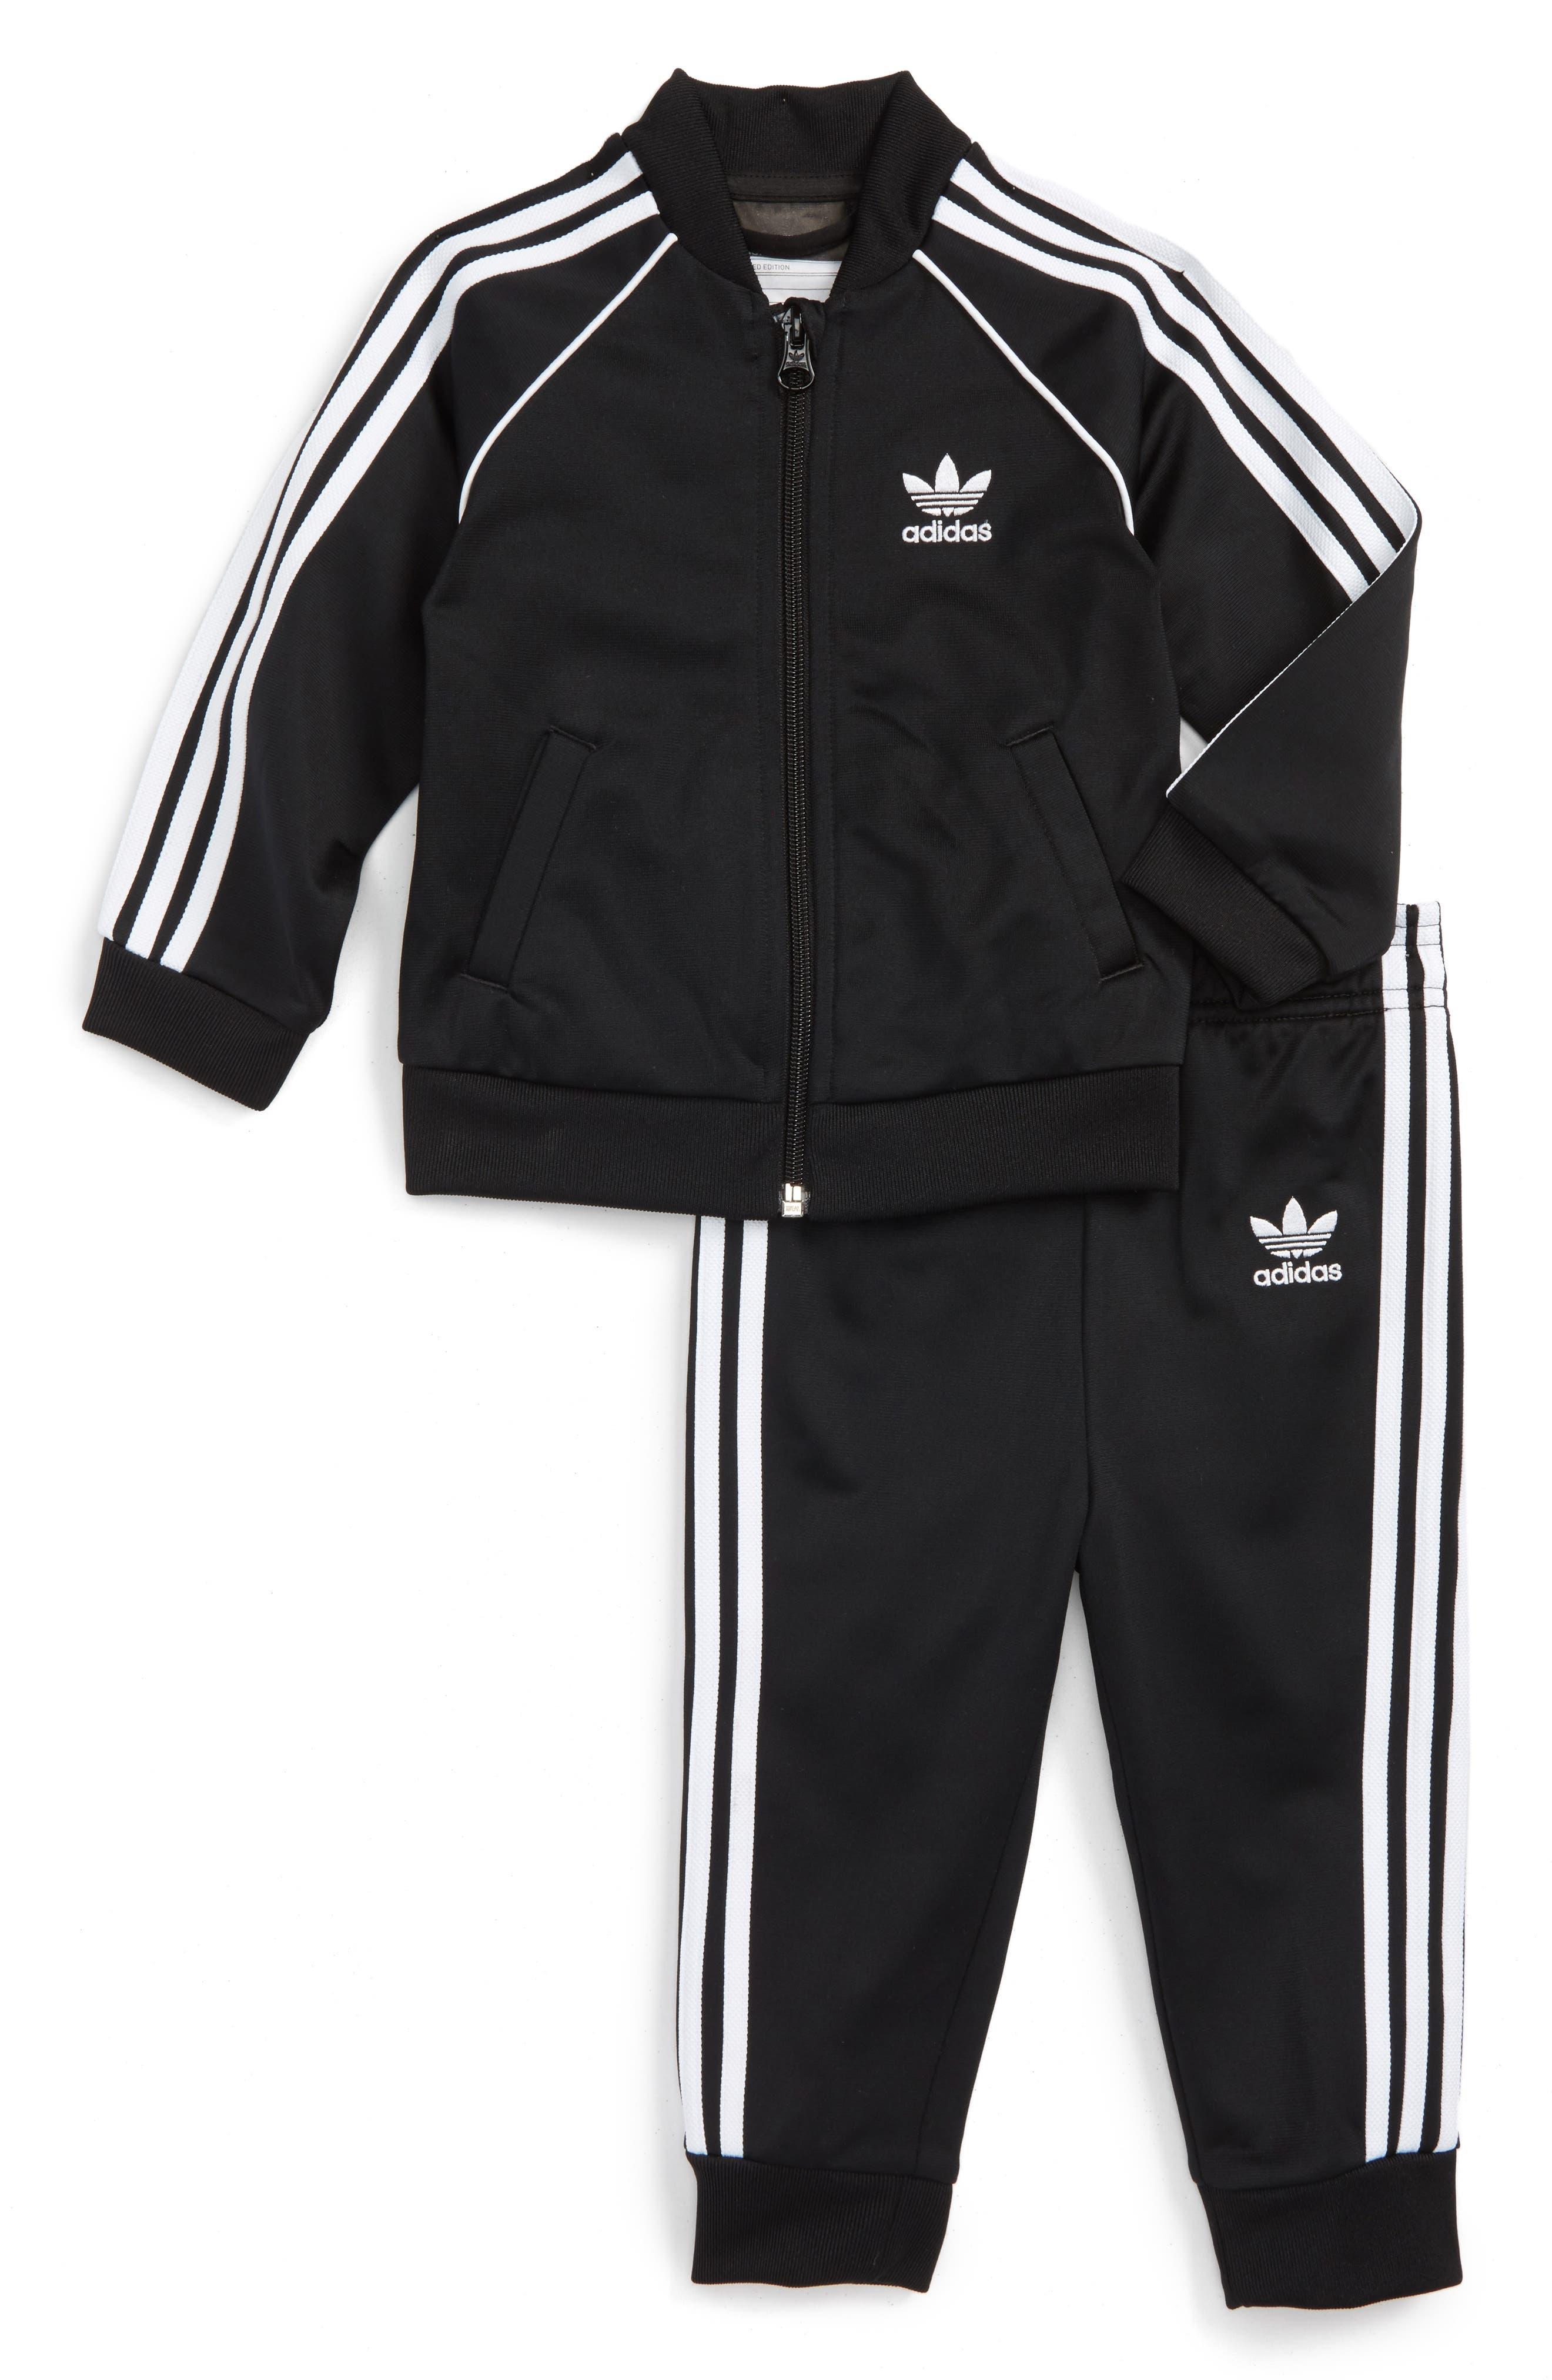 Alternate Image 1 Selected - adidas Originals Track Jacket & Athletic Pants Set (Baby)